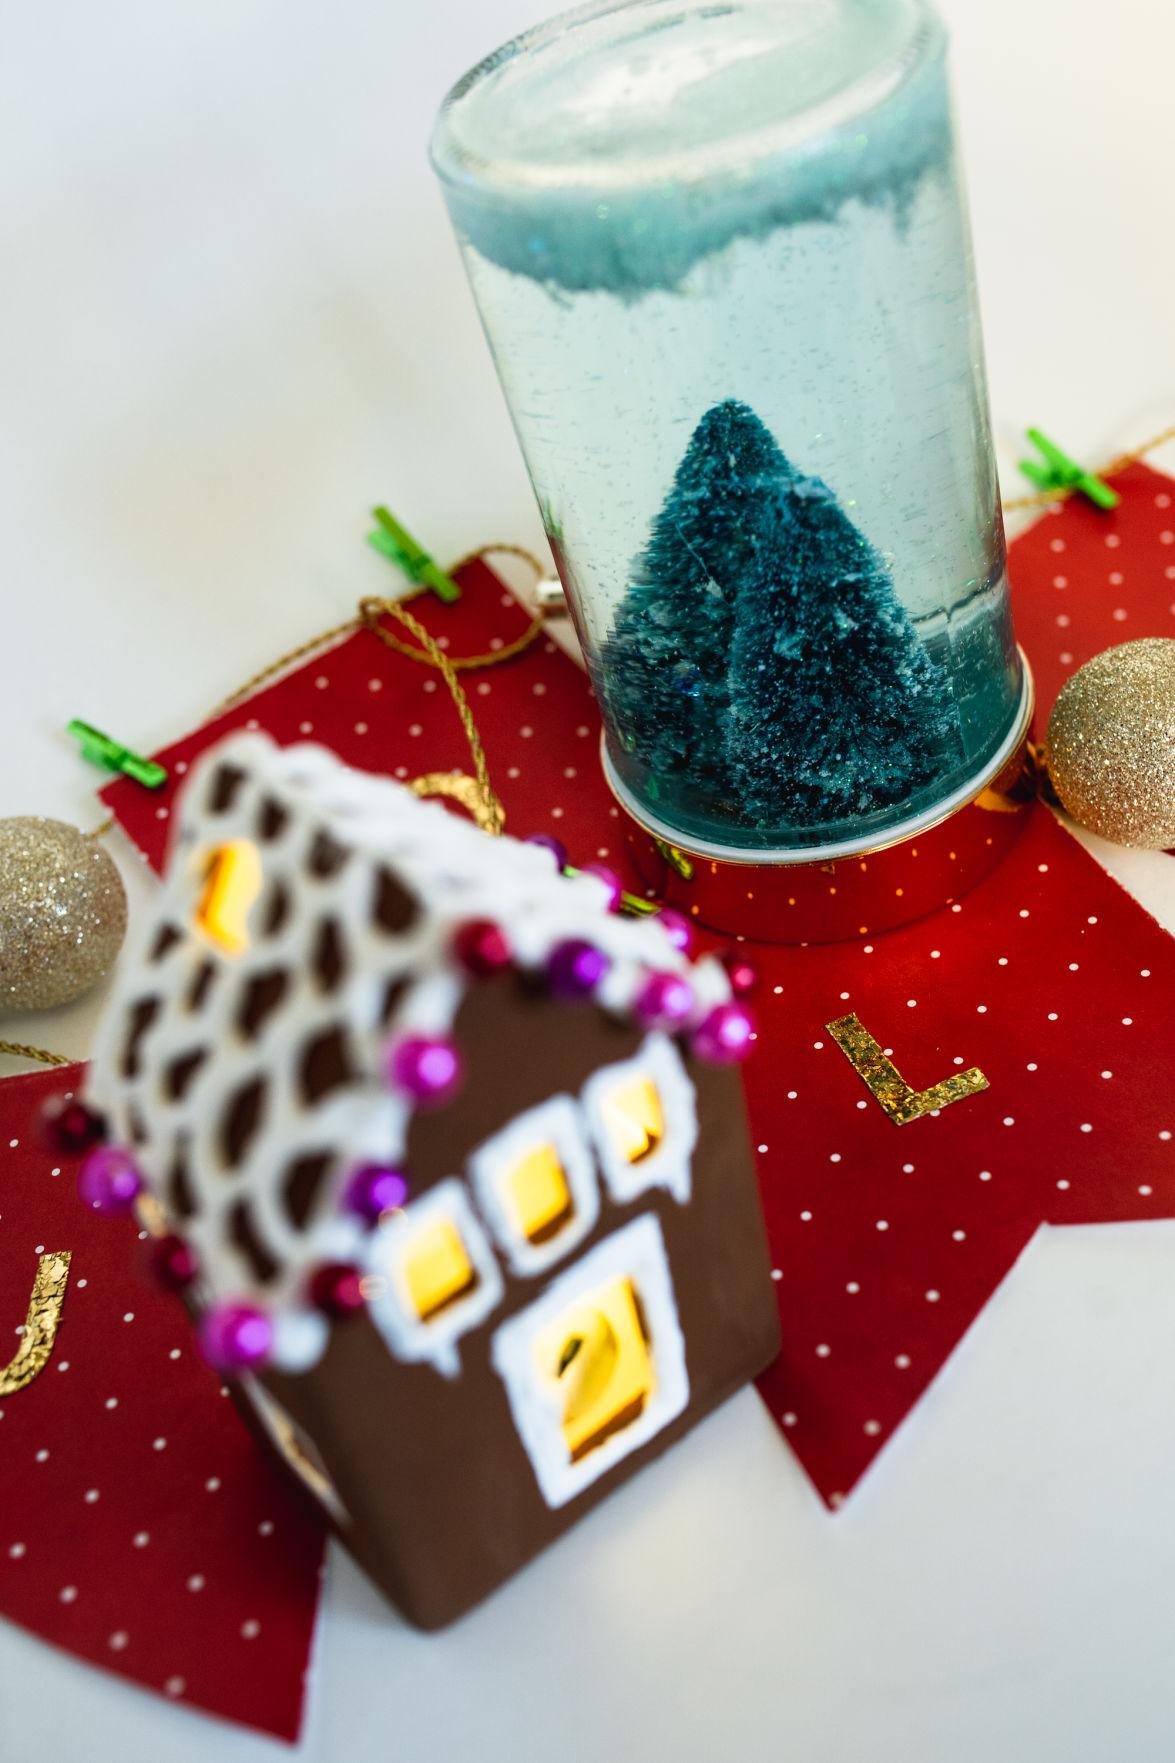 121820_mer_new_christmascrafts-7.jpg